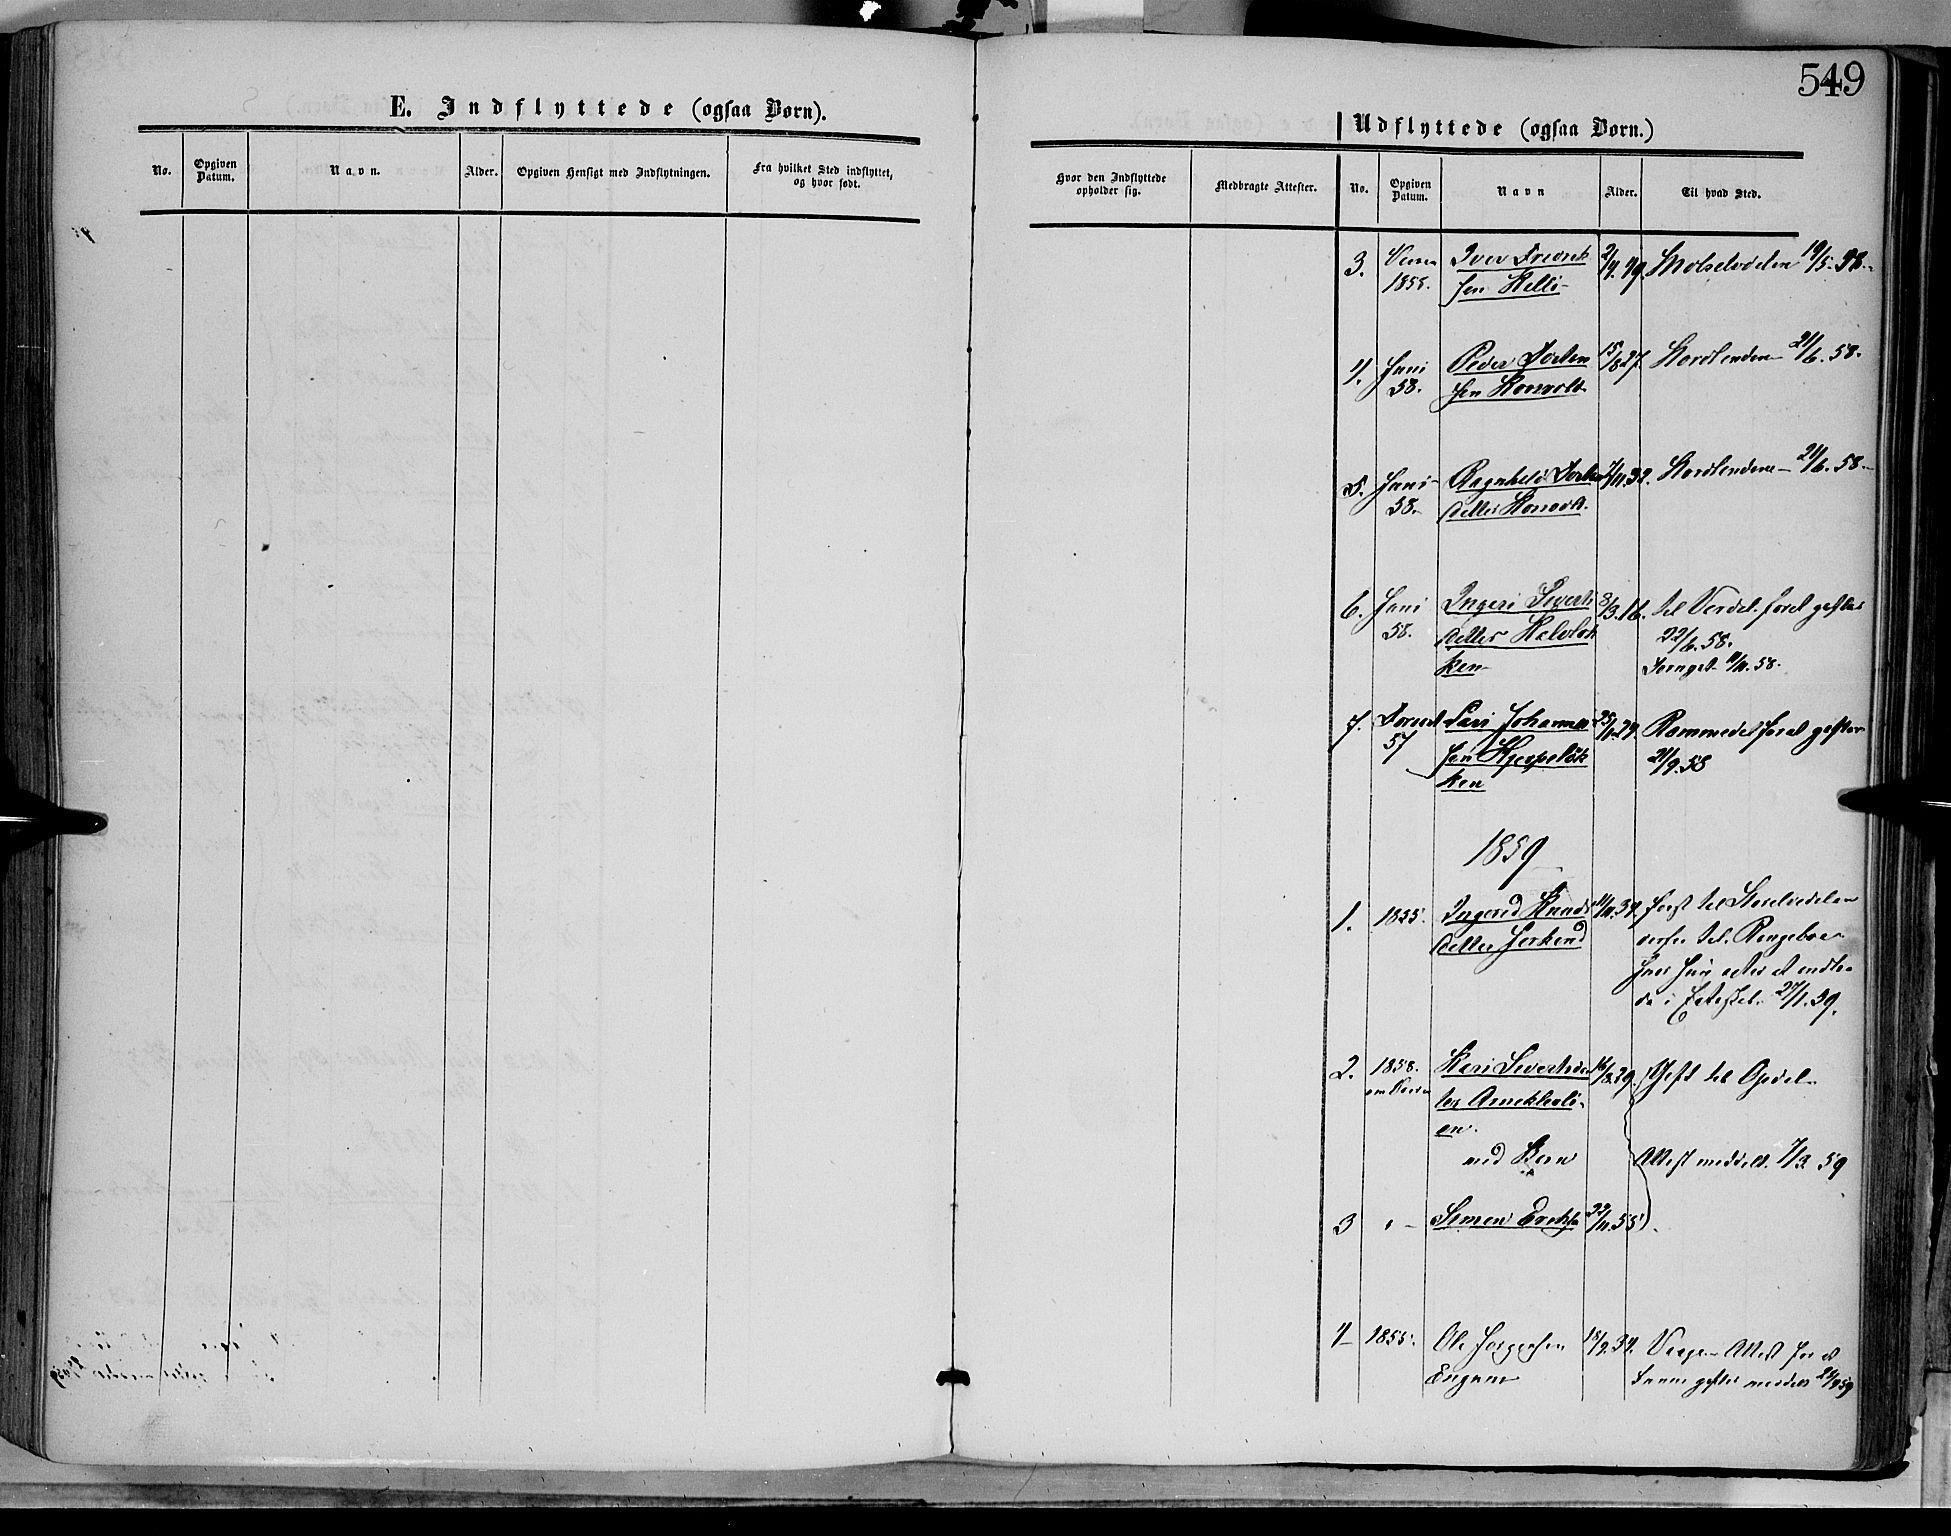 SAH, Dovre prestekontor, Ministerialbok nr. 1, 1854-1878, s. 549